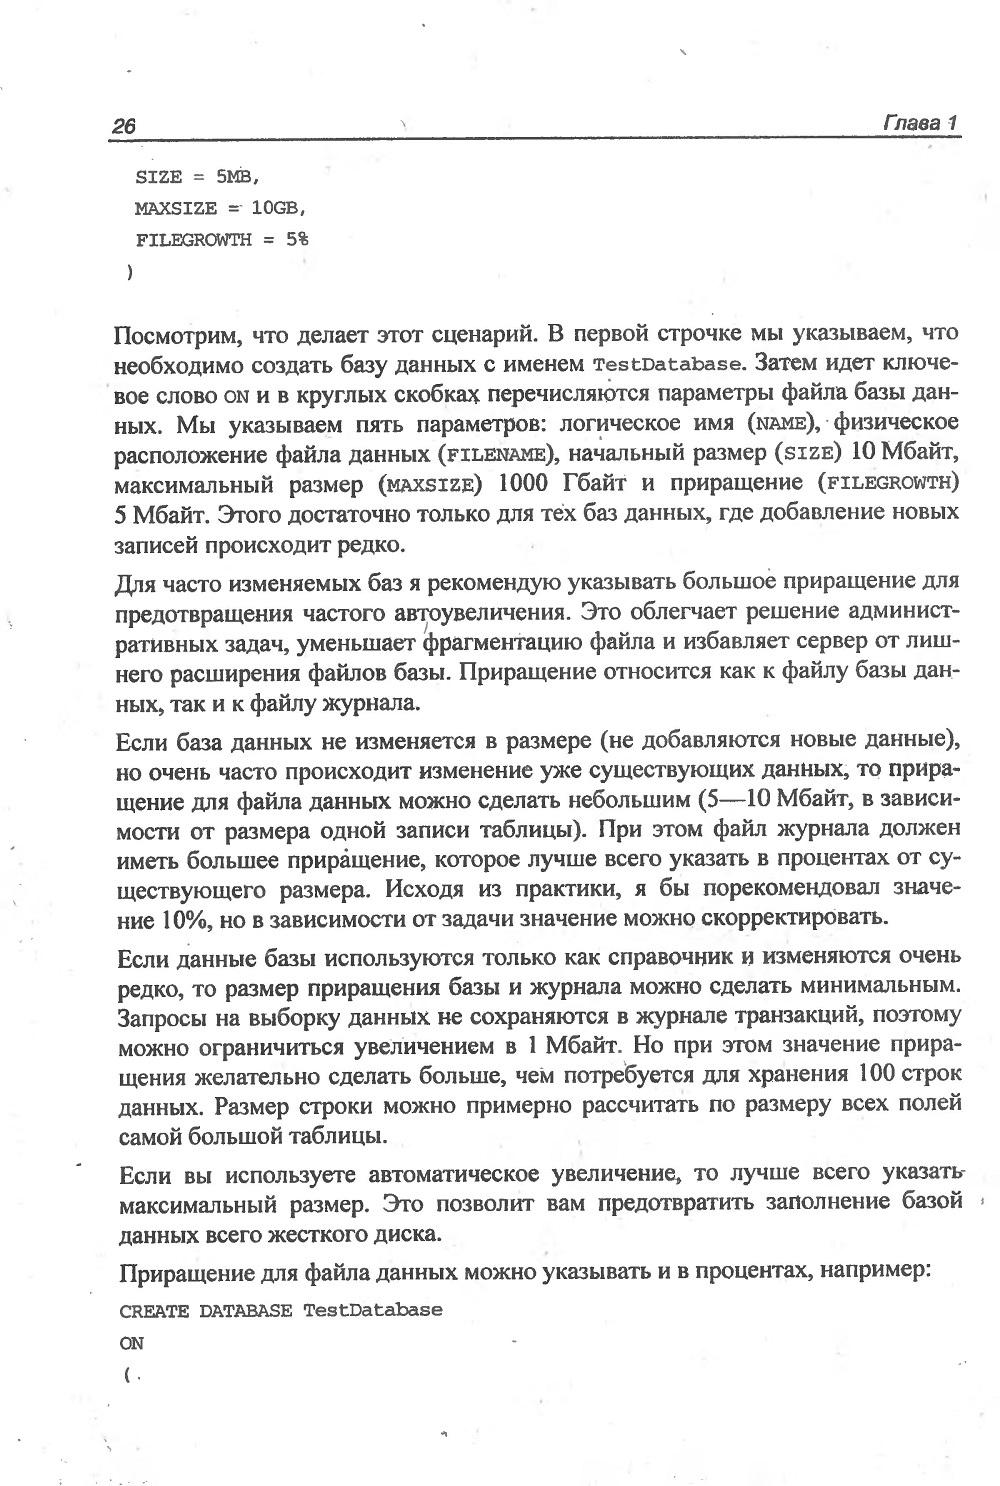 http://i2.imageban.ru/out/2014/01/20/959d92acb779fad17ed6dfd5aaabae57.jpg